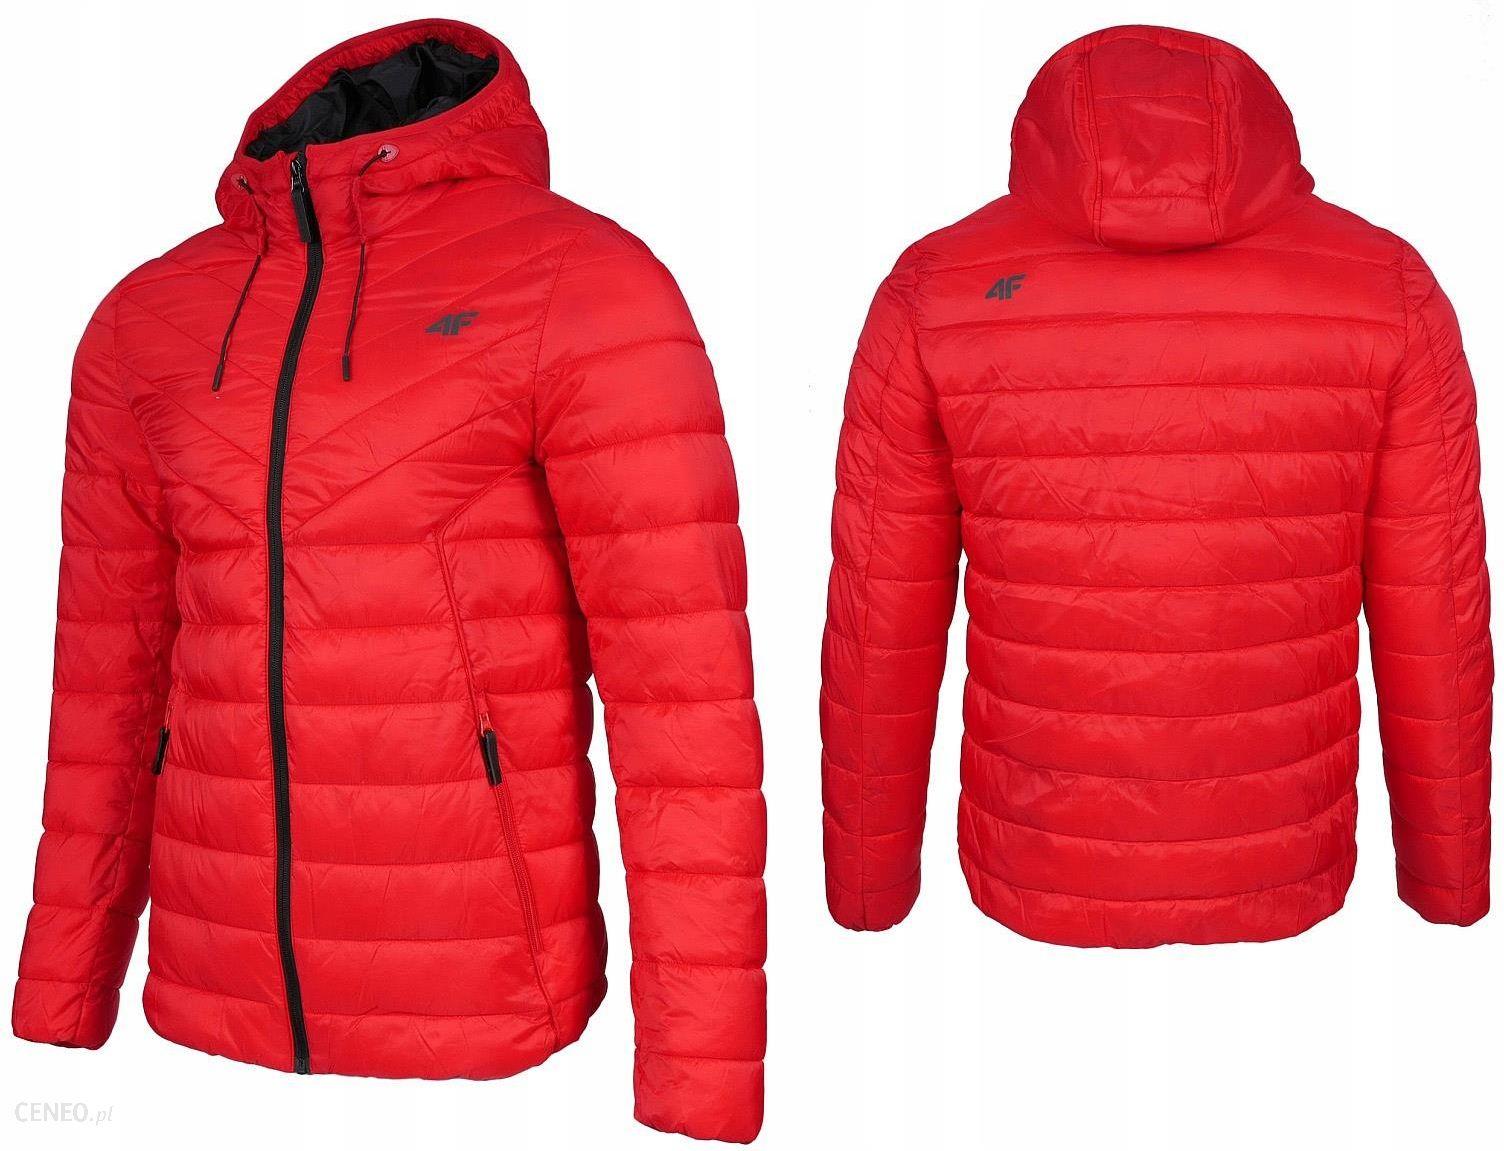 4f kurtka męska zimowa puchowa pikowana